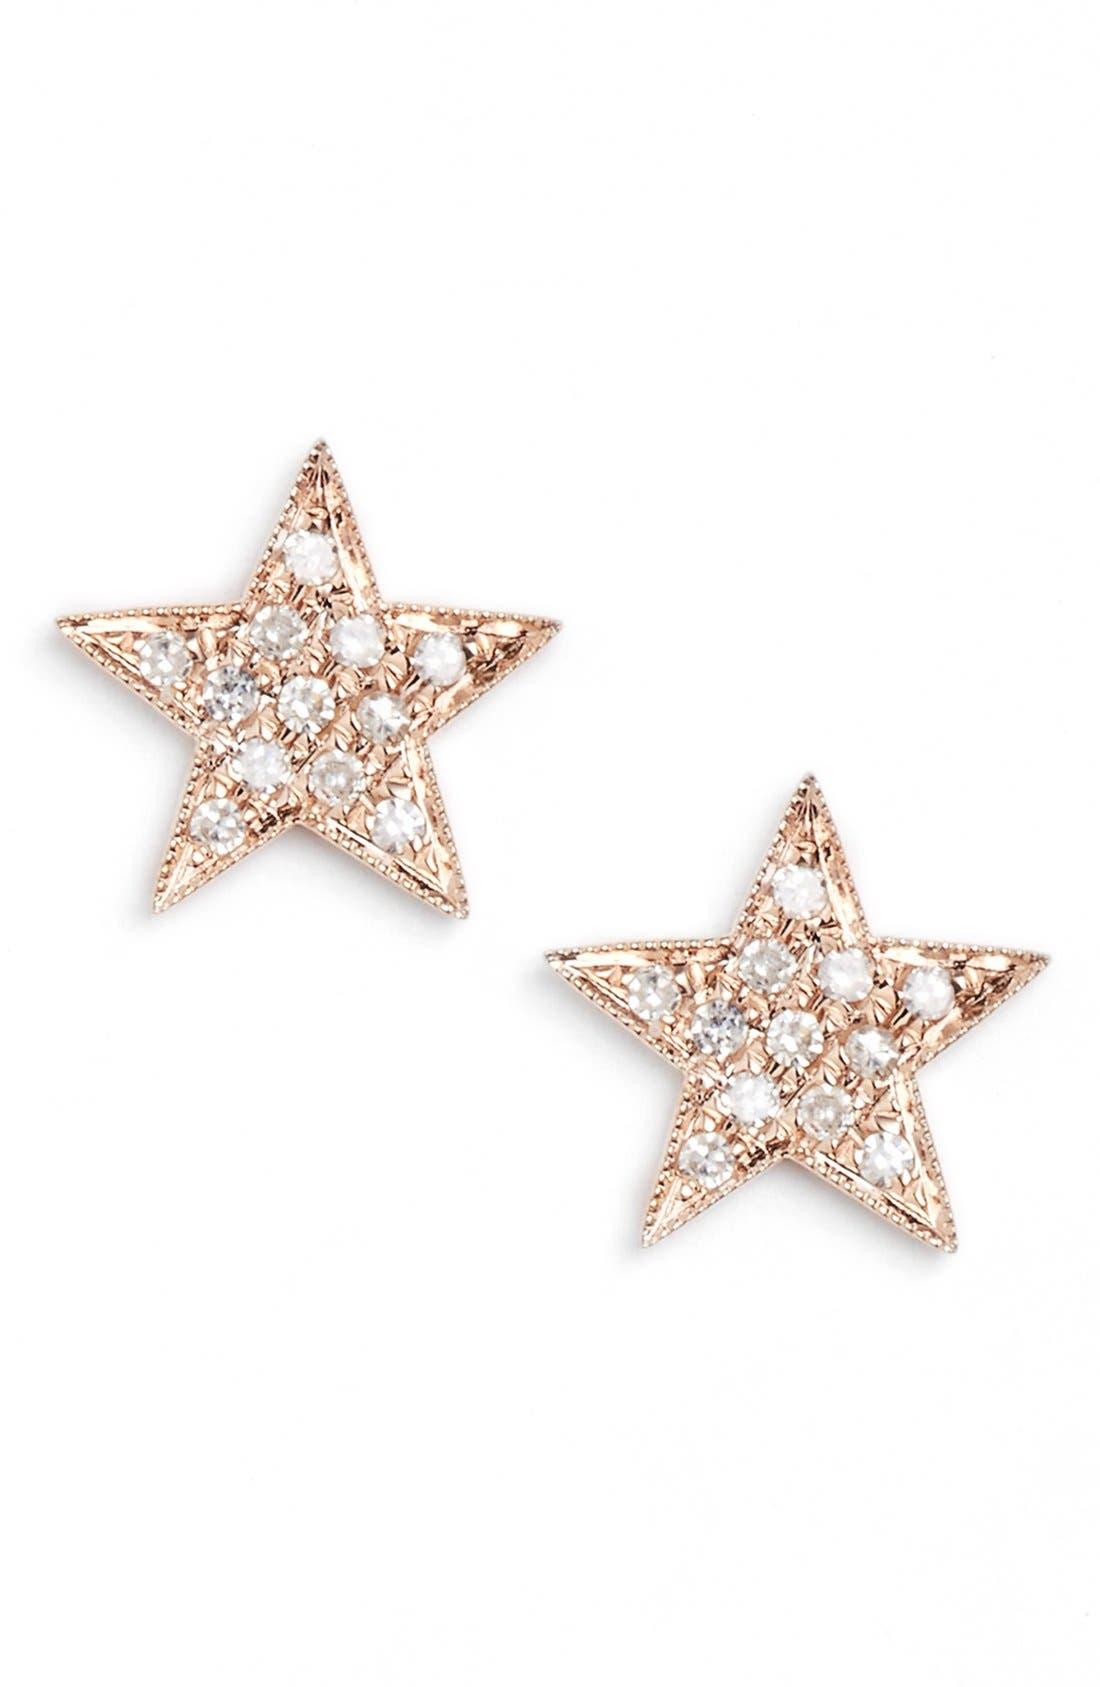 Dana Rebecca Designs 'Julianne Himiko' Diamond Star Stud Earrings